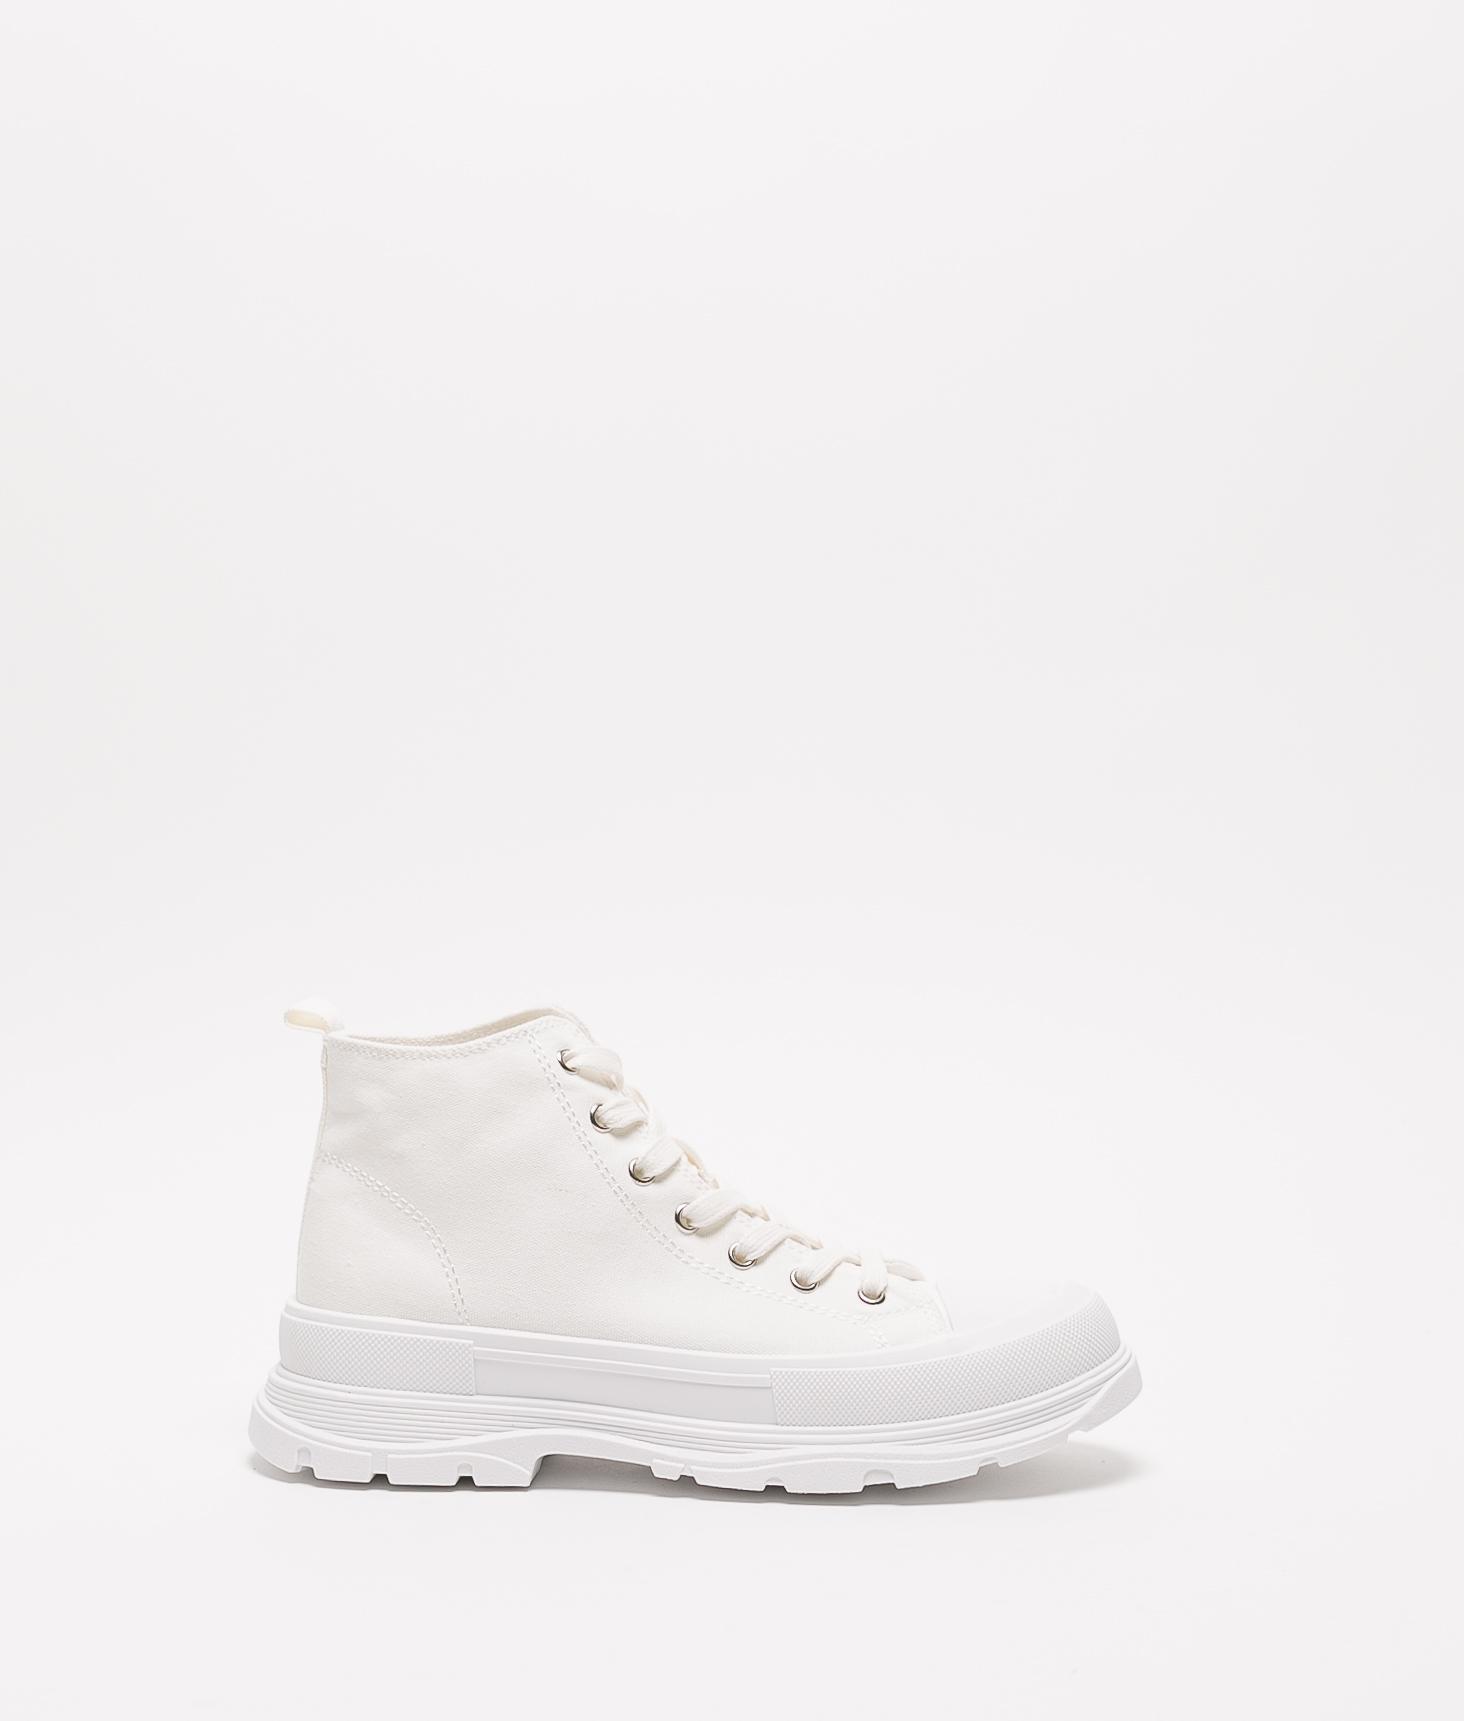 Sneakers Lenui - Bianco